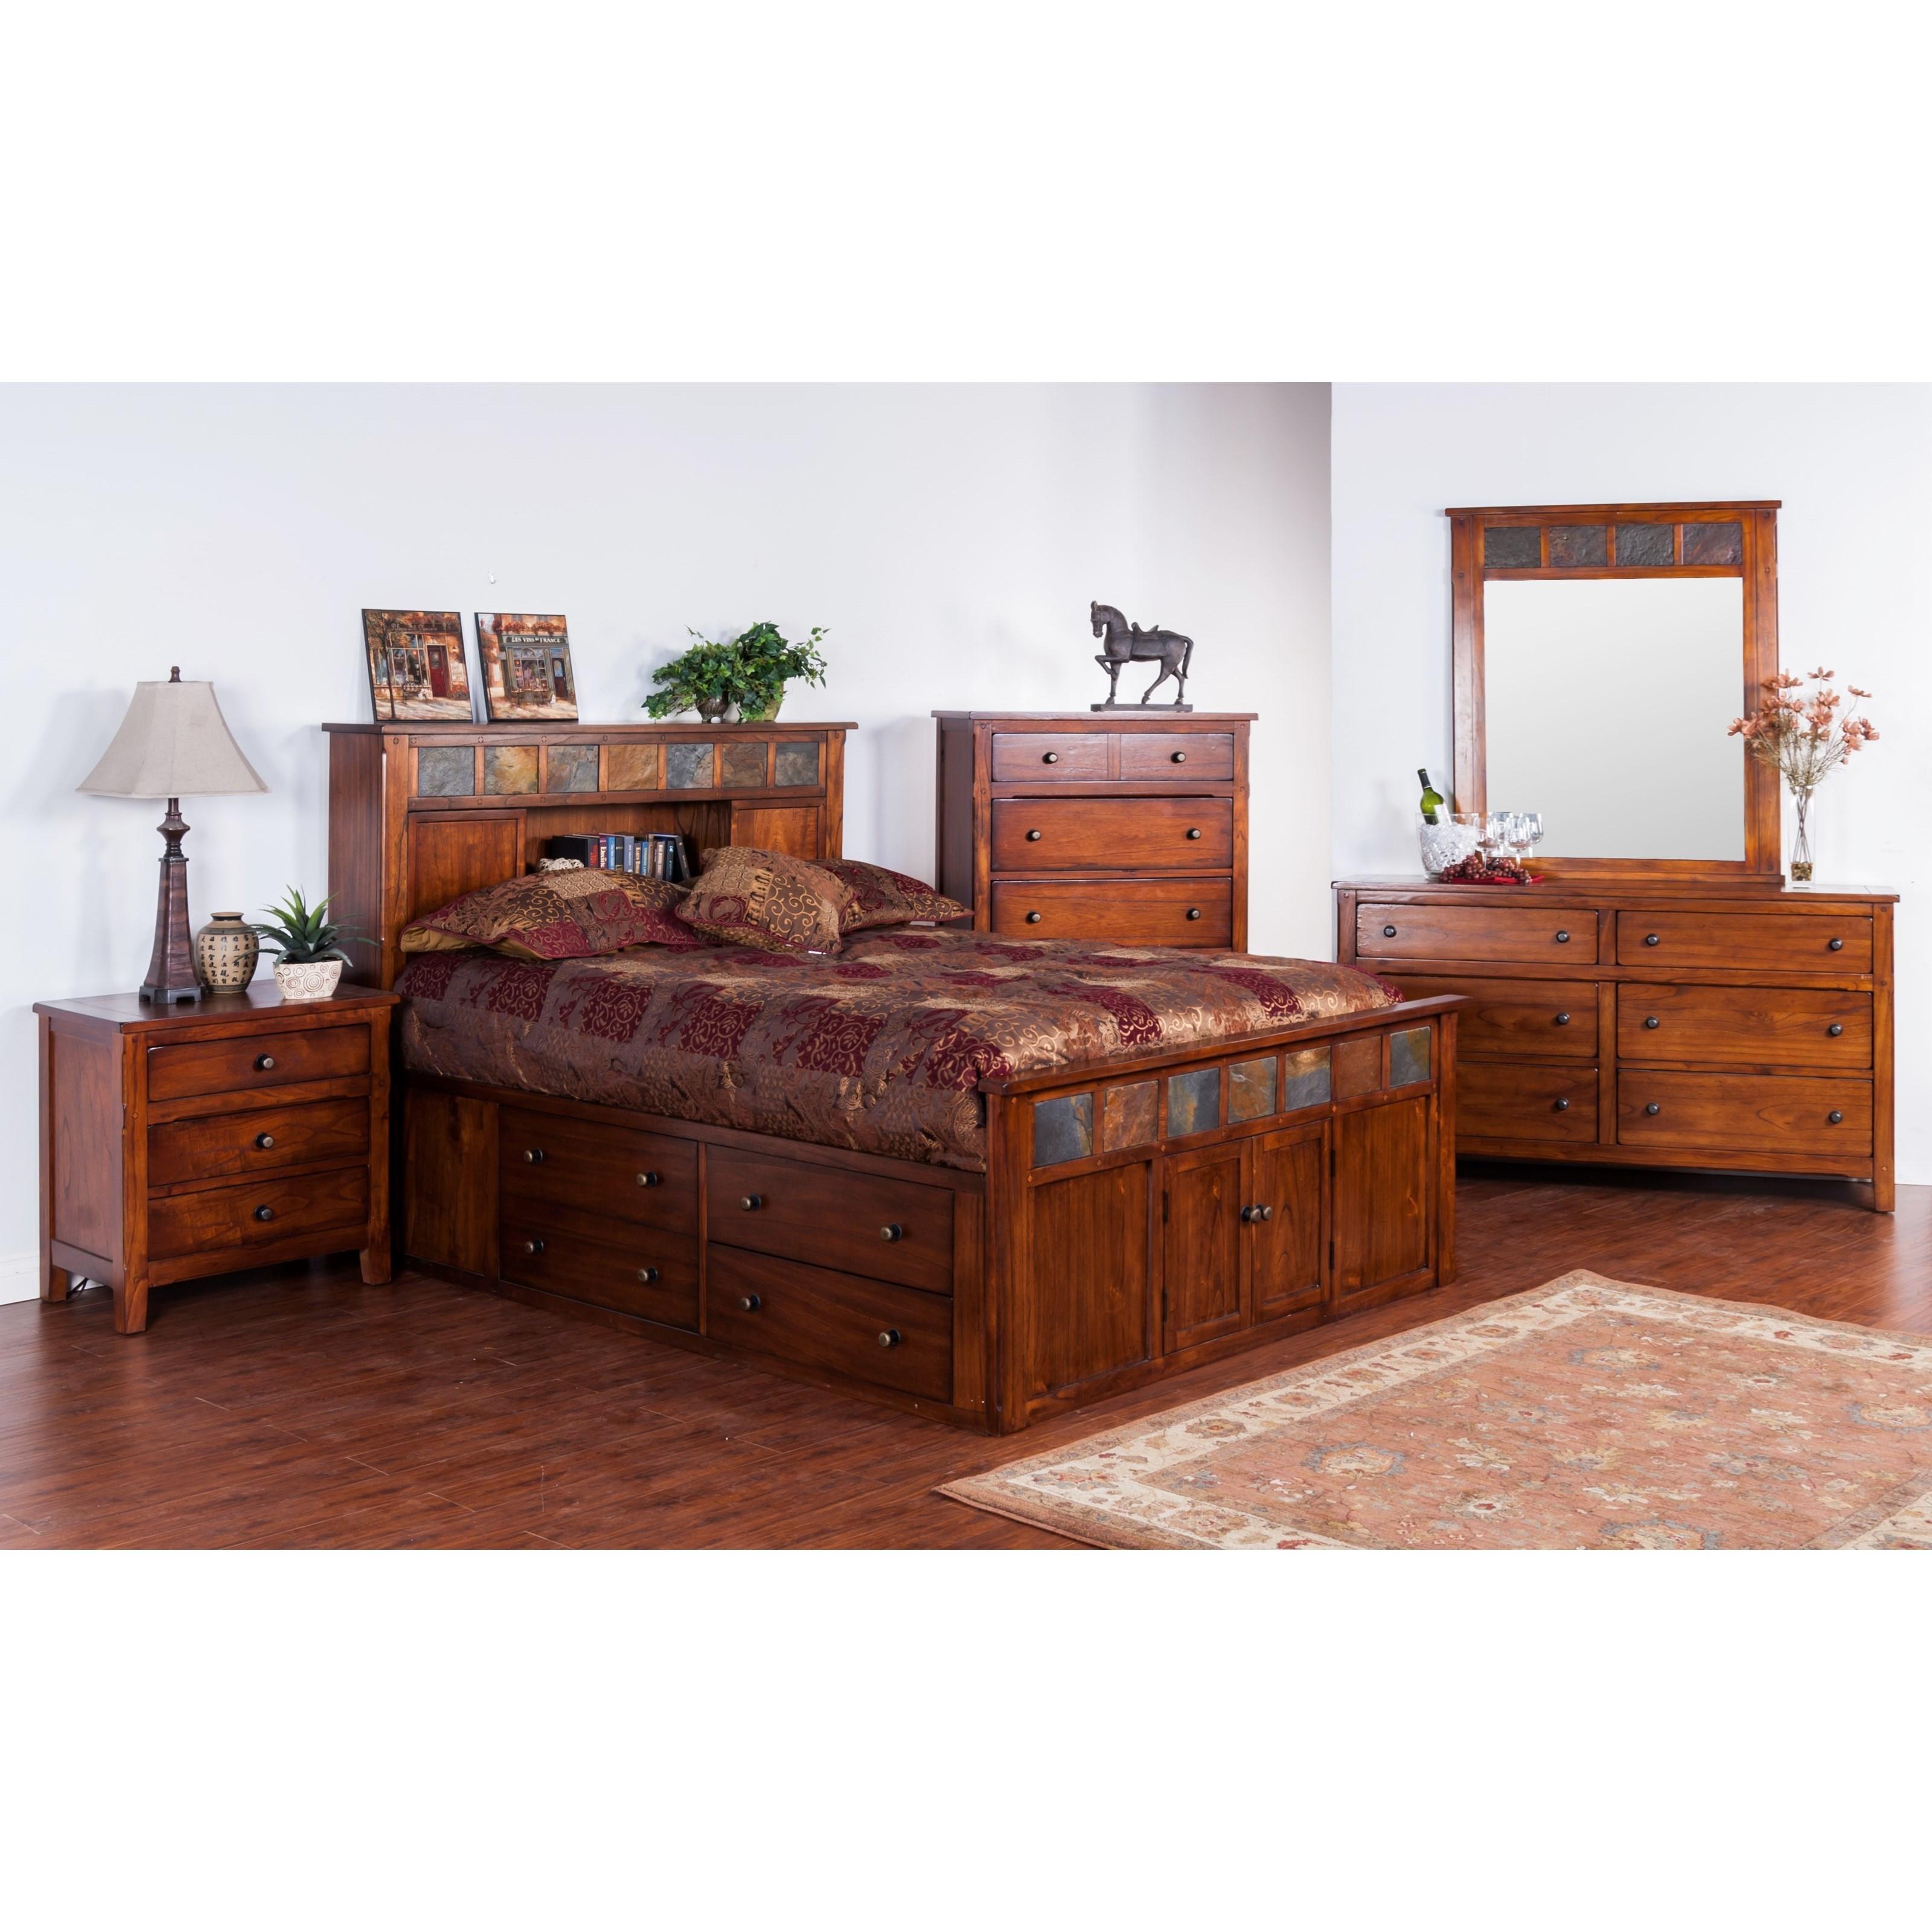 Sunny designs santa fe queen storage bed w slate fashion furniture bookcase beds for Sunny designs bedroom furniture